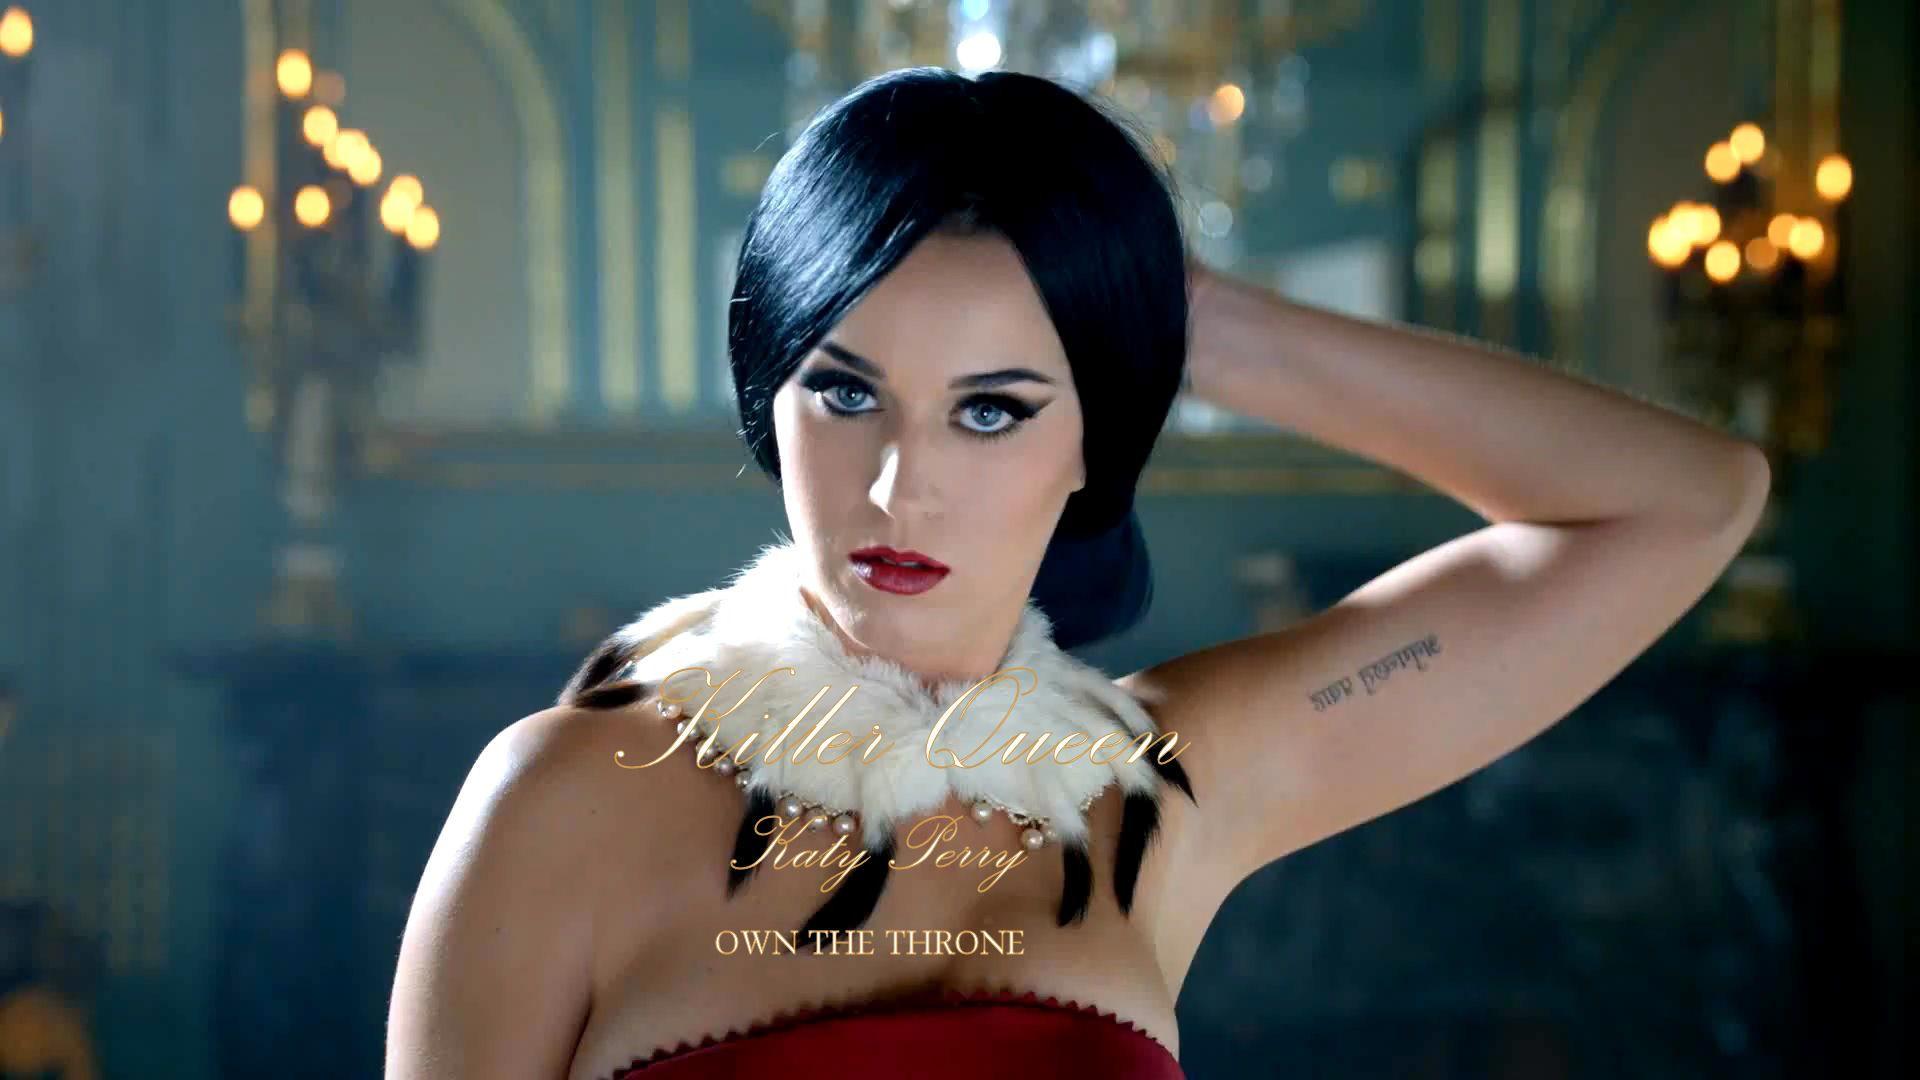 Katy Perry Hot 2014 Wallpapers Katy perry hot, Katy